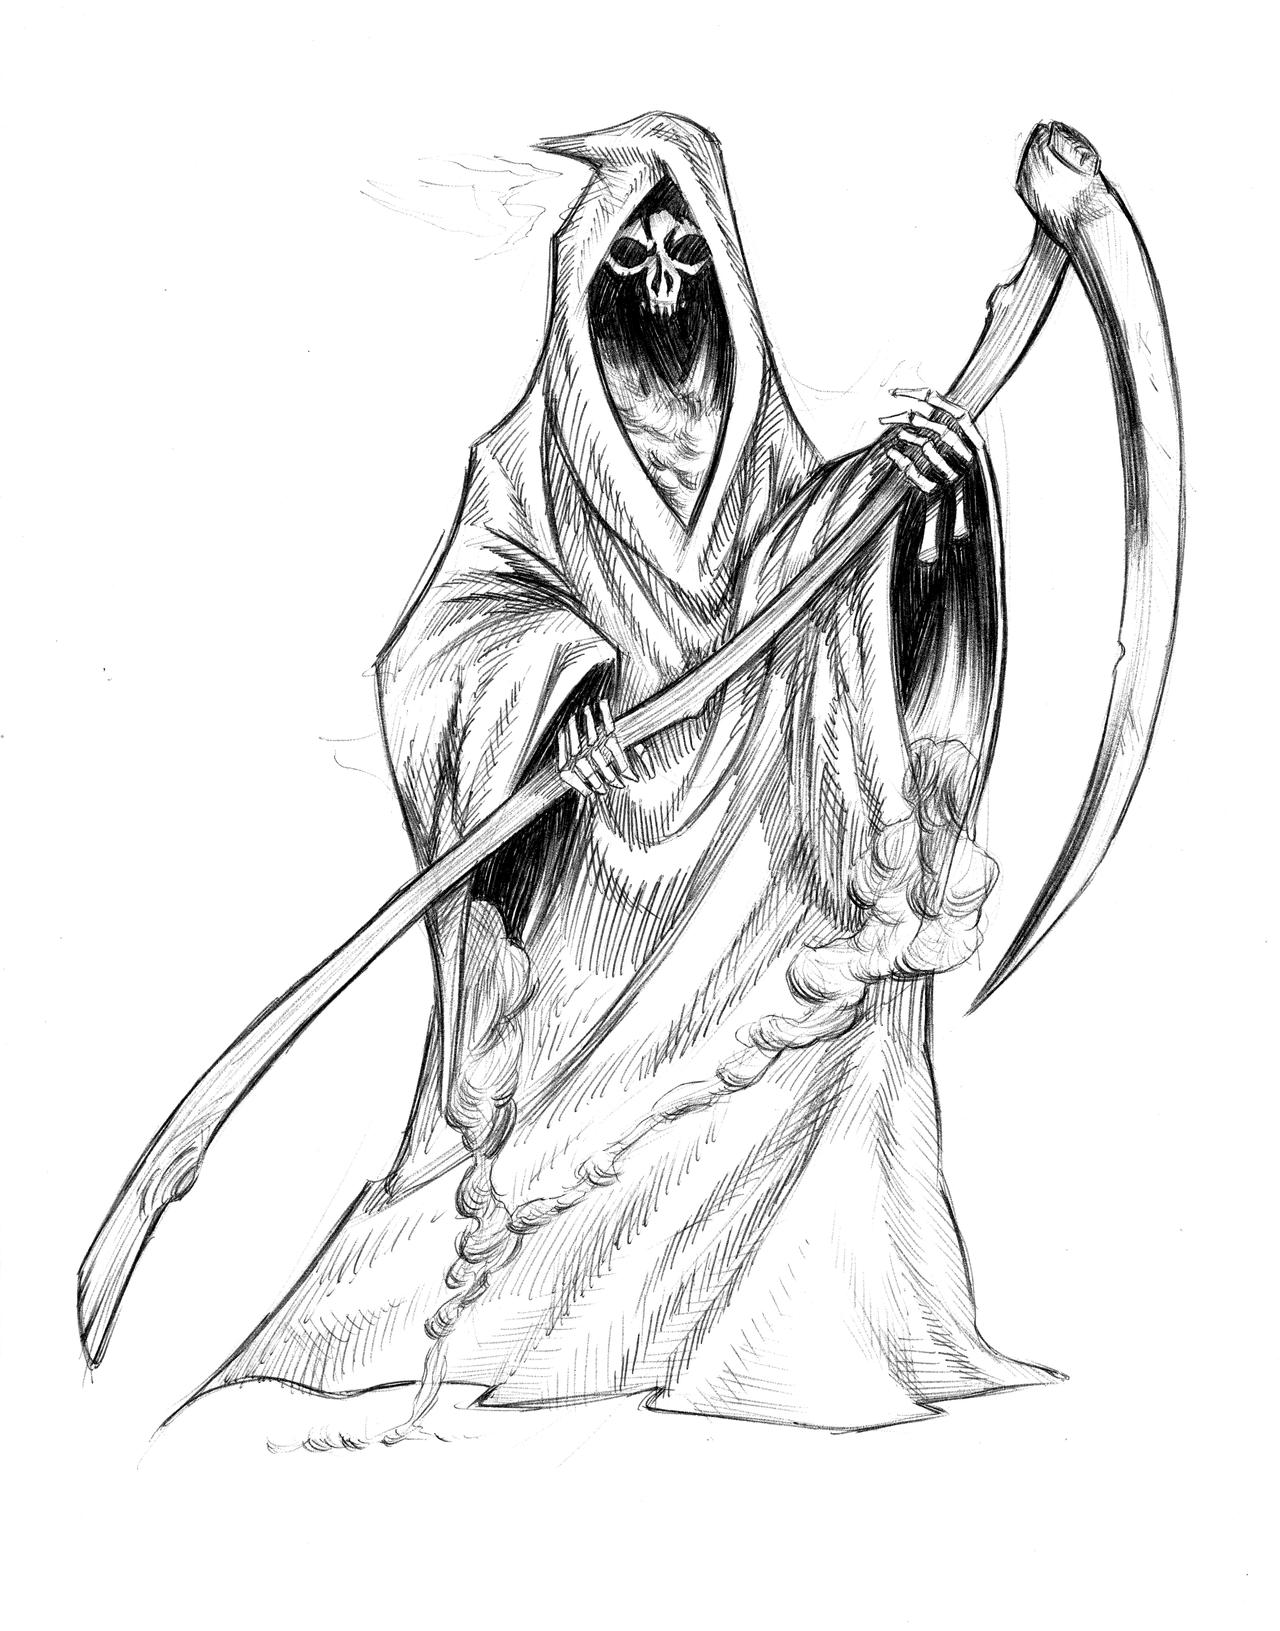 Grim Reaper 1 by sketchbencky5 on DeviantArt